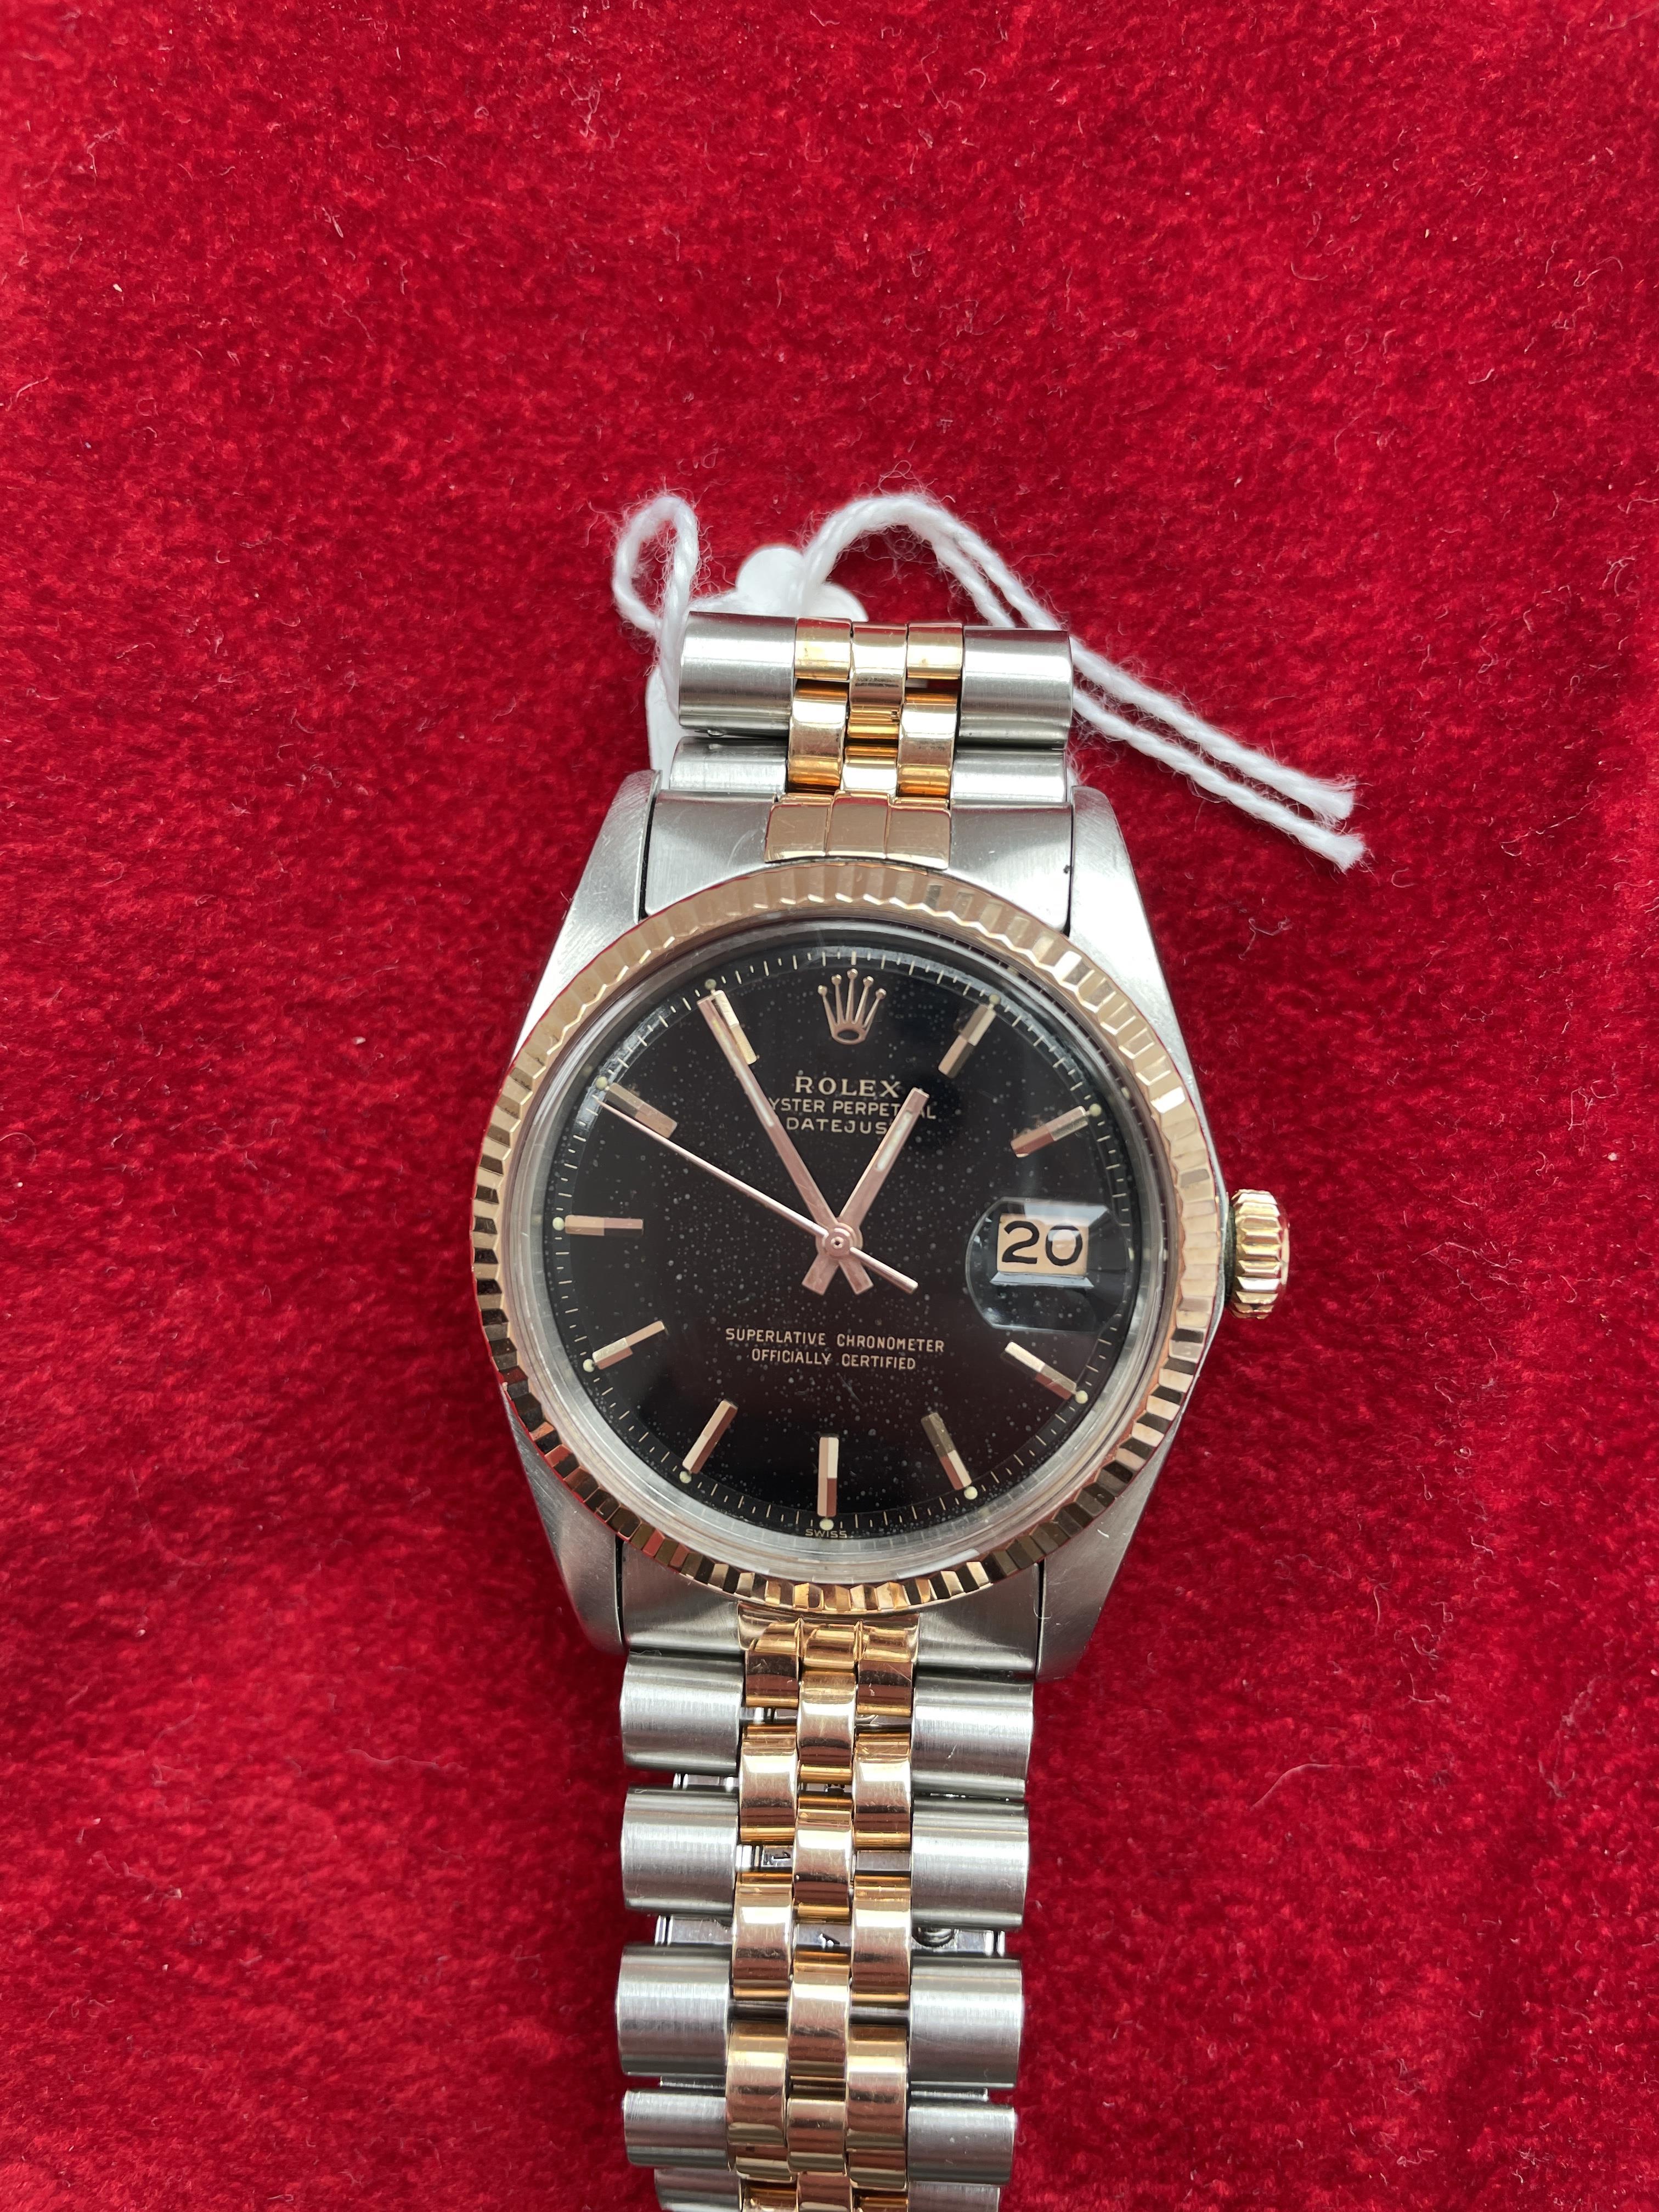 Rolex Datejust ref 1601 Steel & Pink Gold - Image 8 of 8